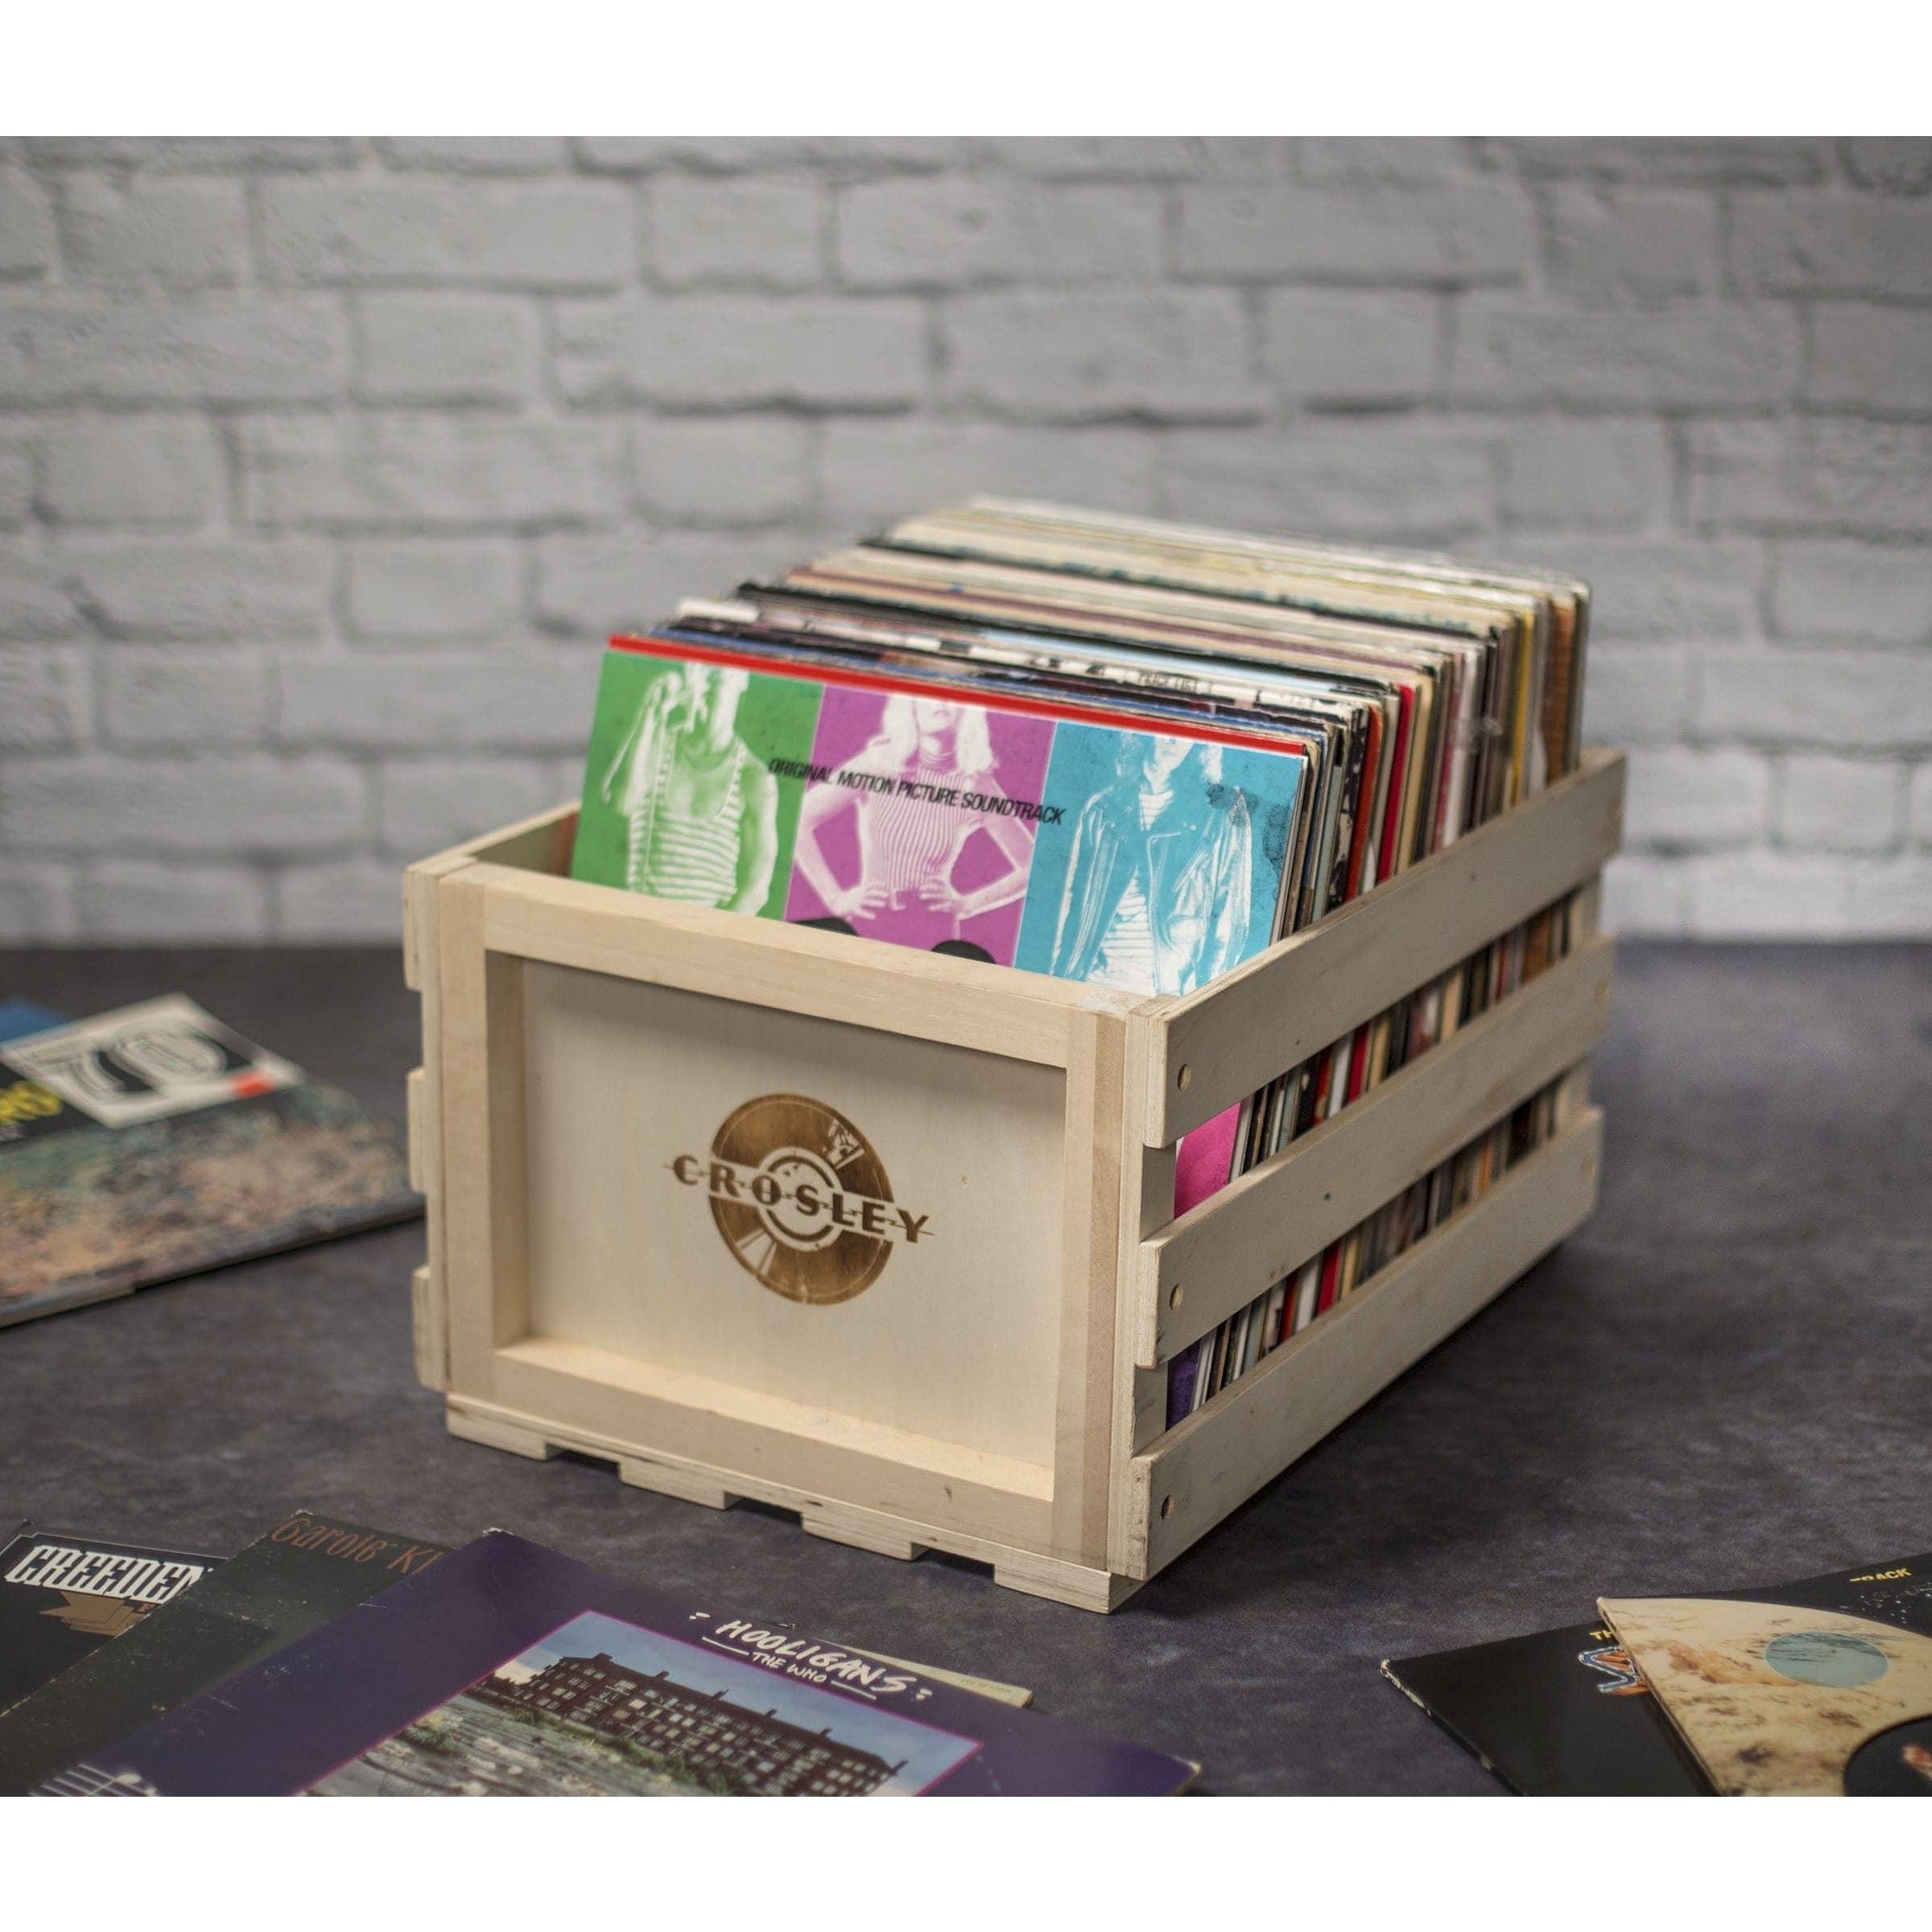 Crosley Record Storage Crate AC1004A